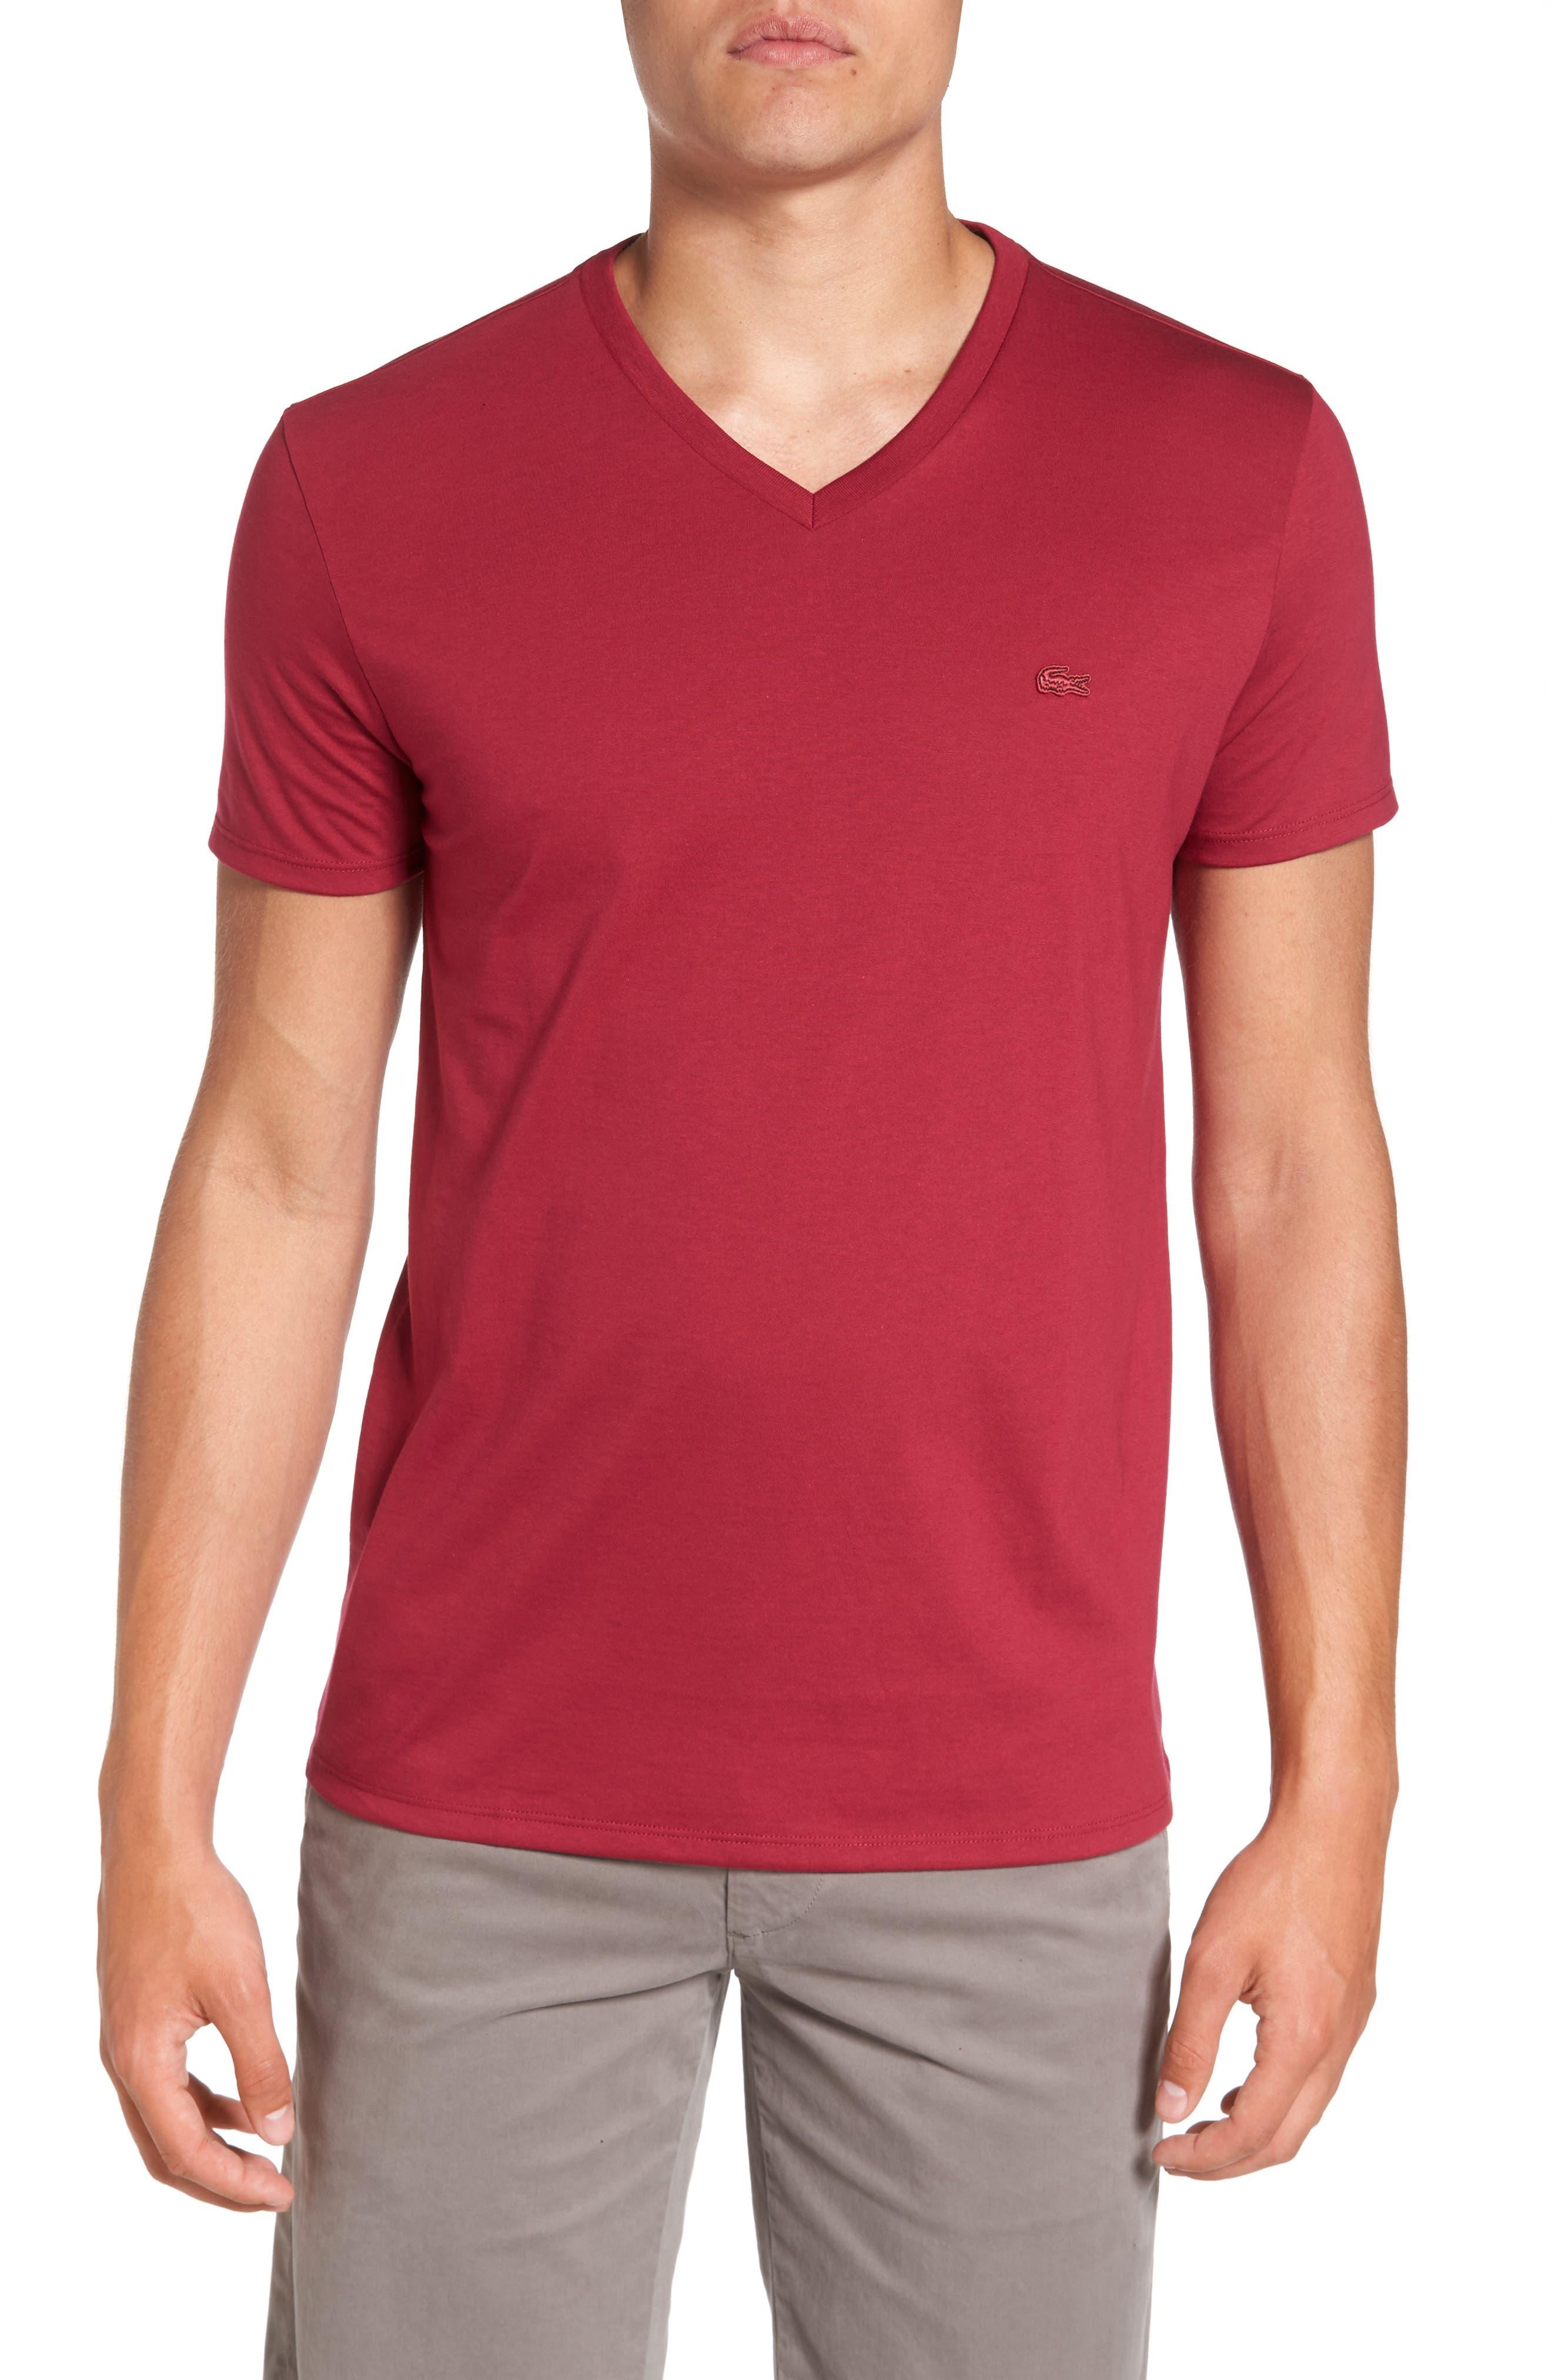 Alternate Image 1 Selected - Lacoste Pima Cotton T-Shirt